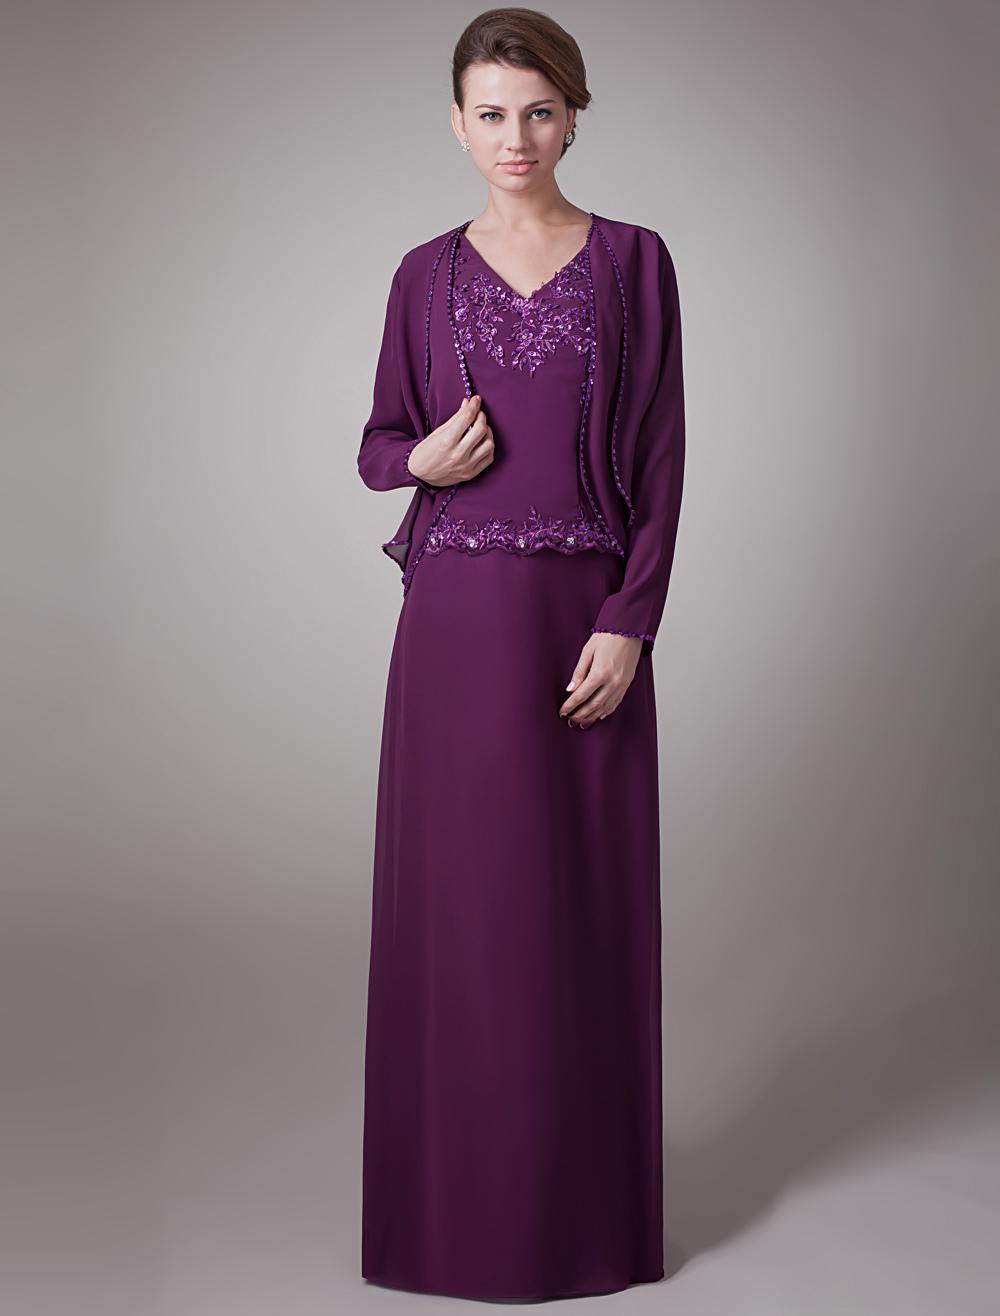 Mother's Dress 2 Piece Set Lavender A Line V Neck Sequin Embroidered Floor Length Party Dress With Jacket